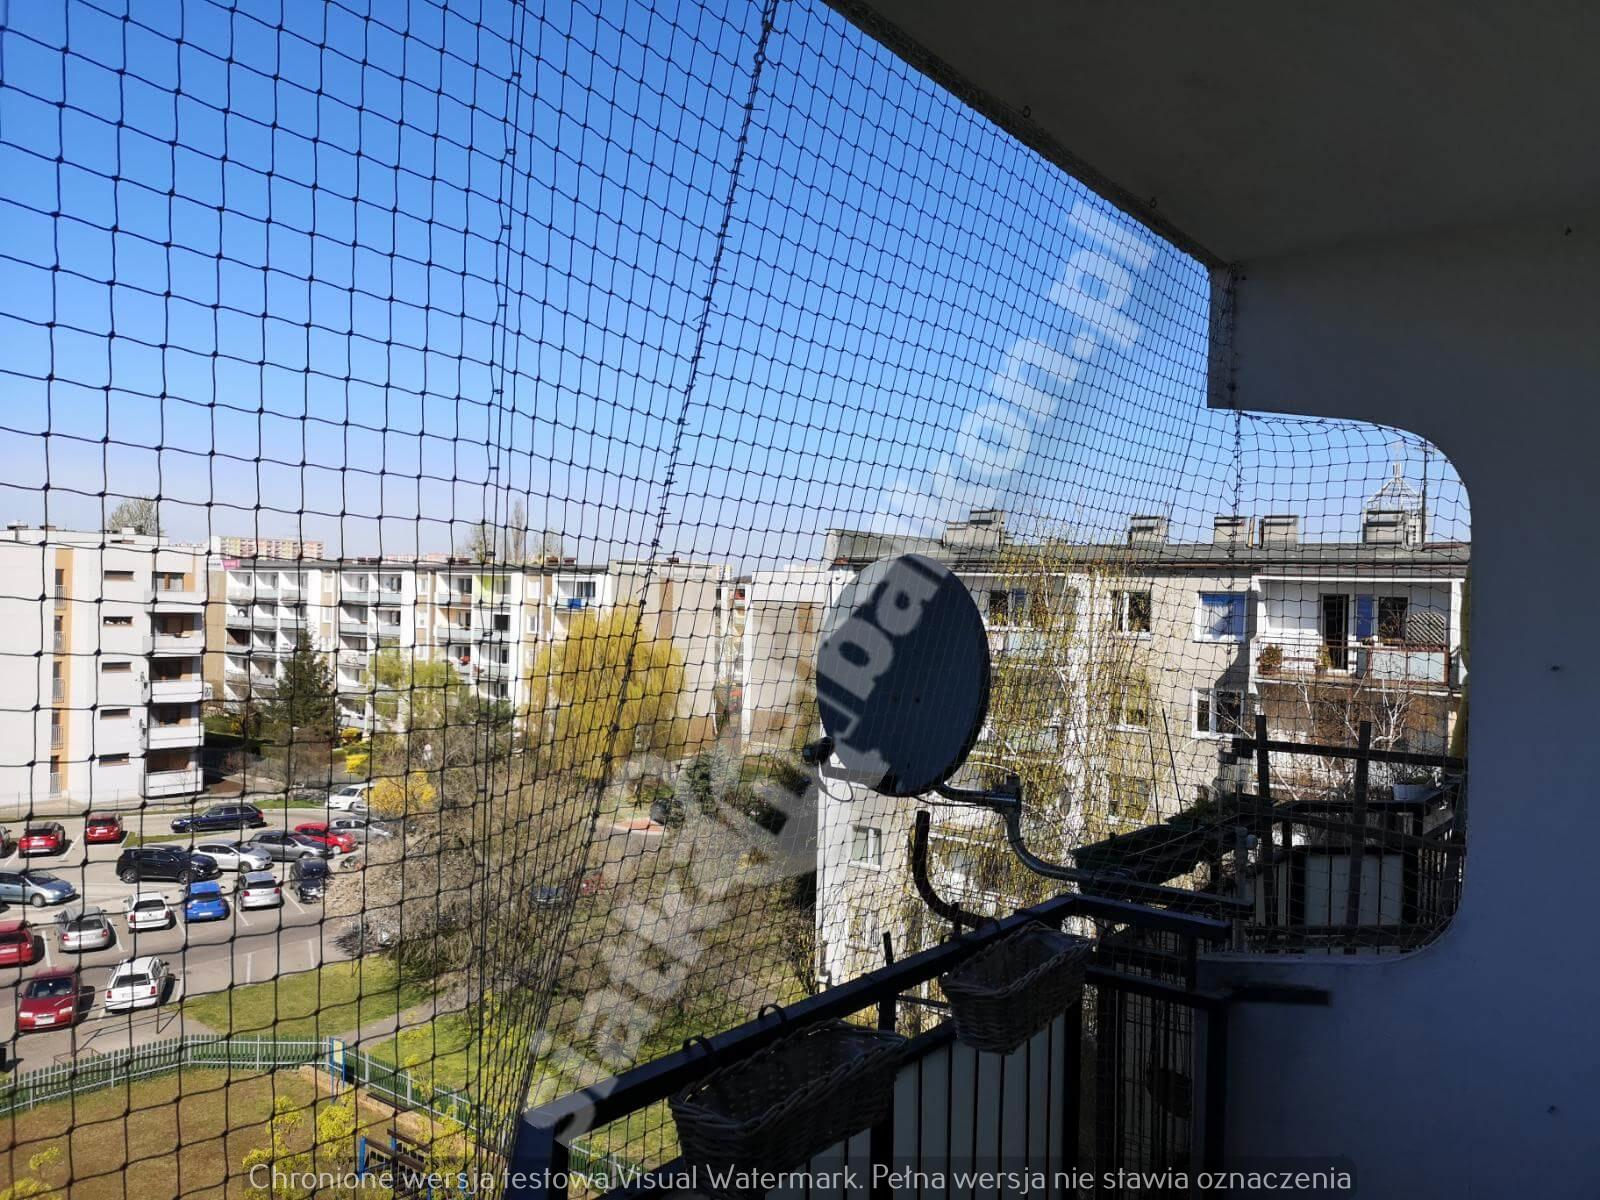 satka-na-balkon-nietypowy-ksztalt (3)